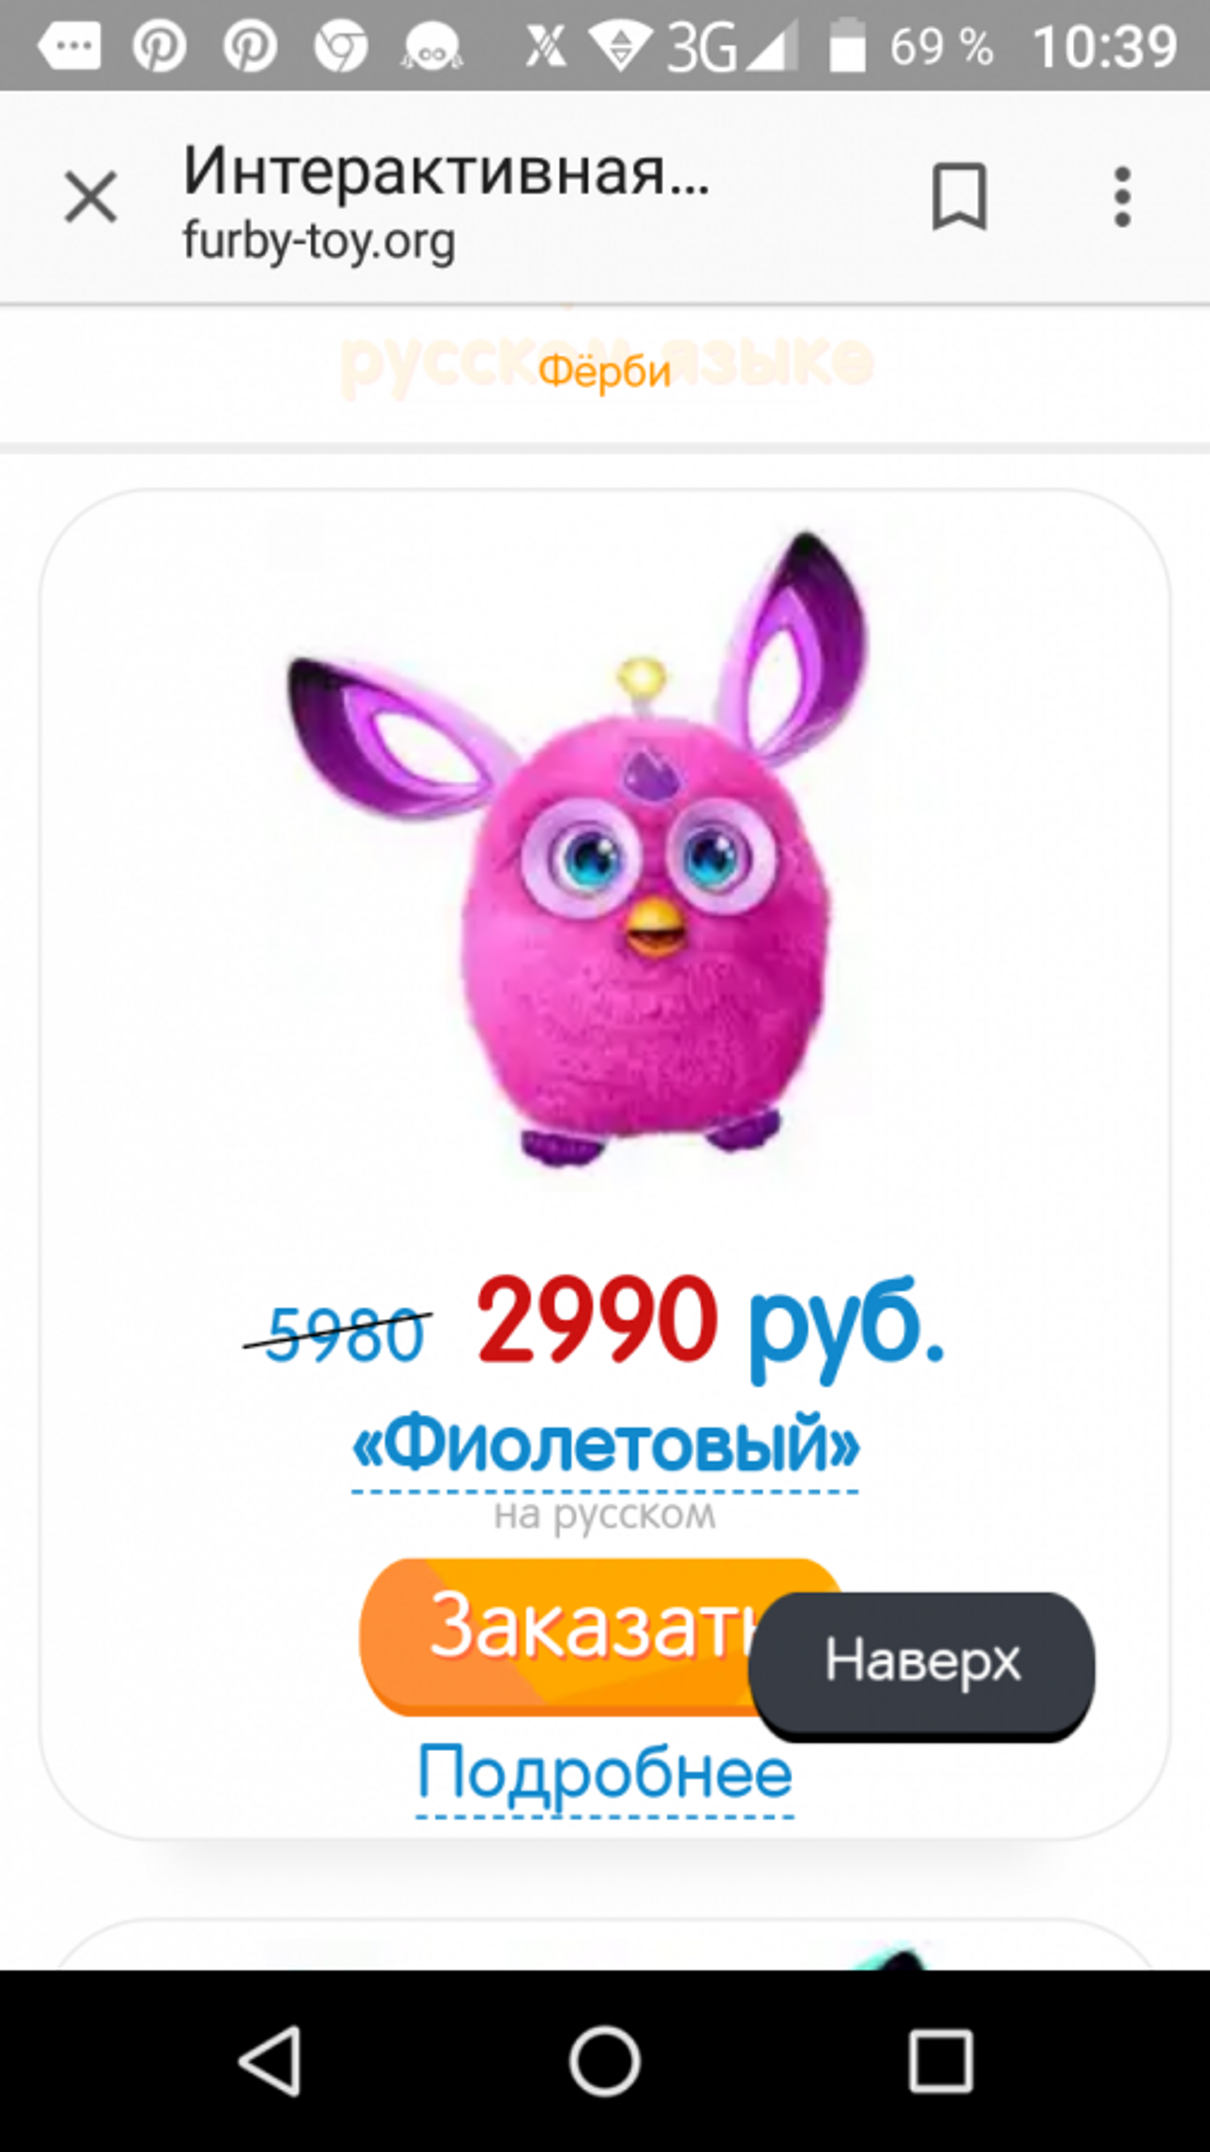 Жалоба-отзыв: Furby-toy.org - Мошеничество.  Фото №1